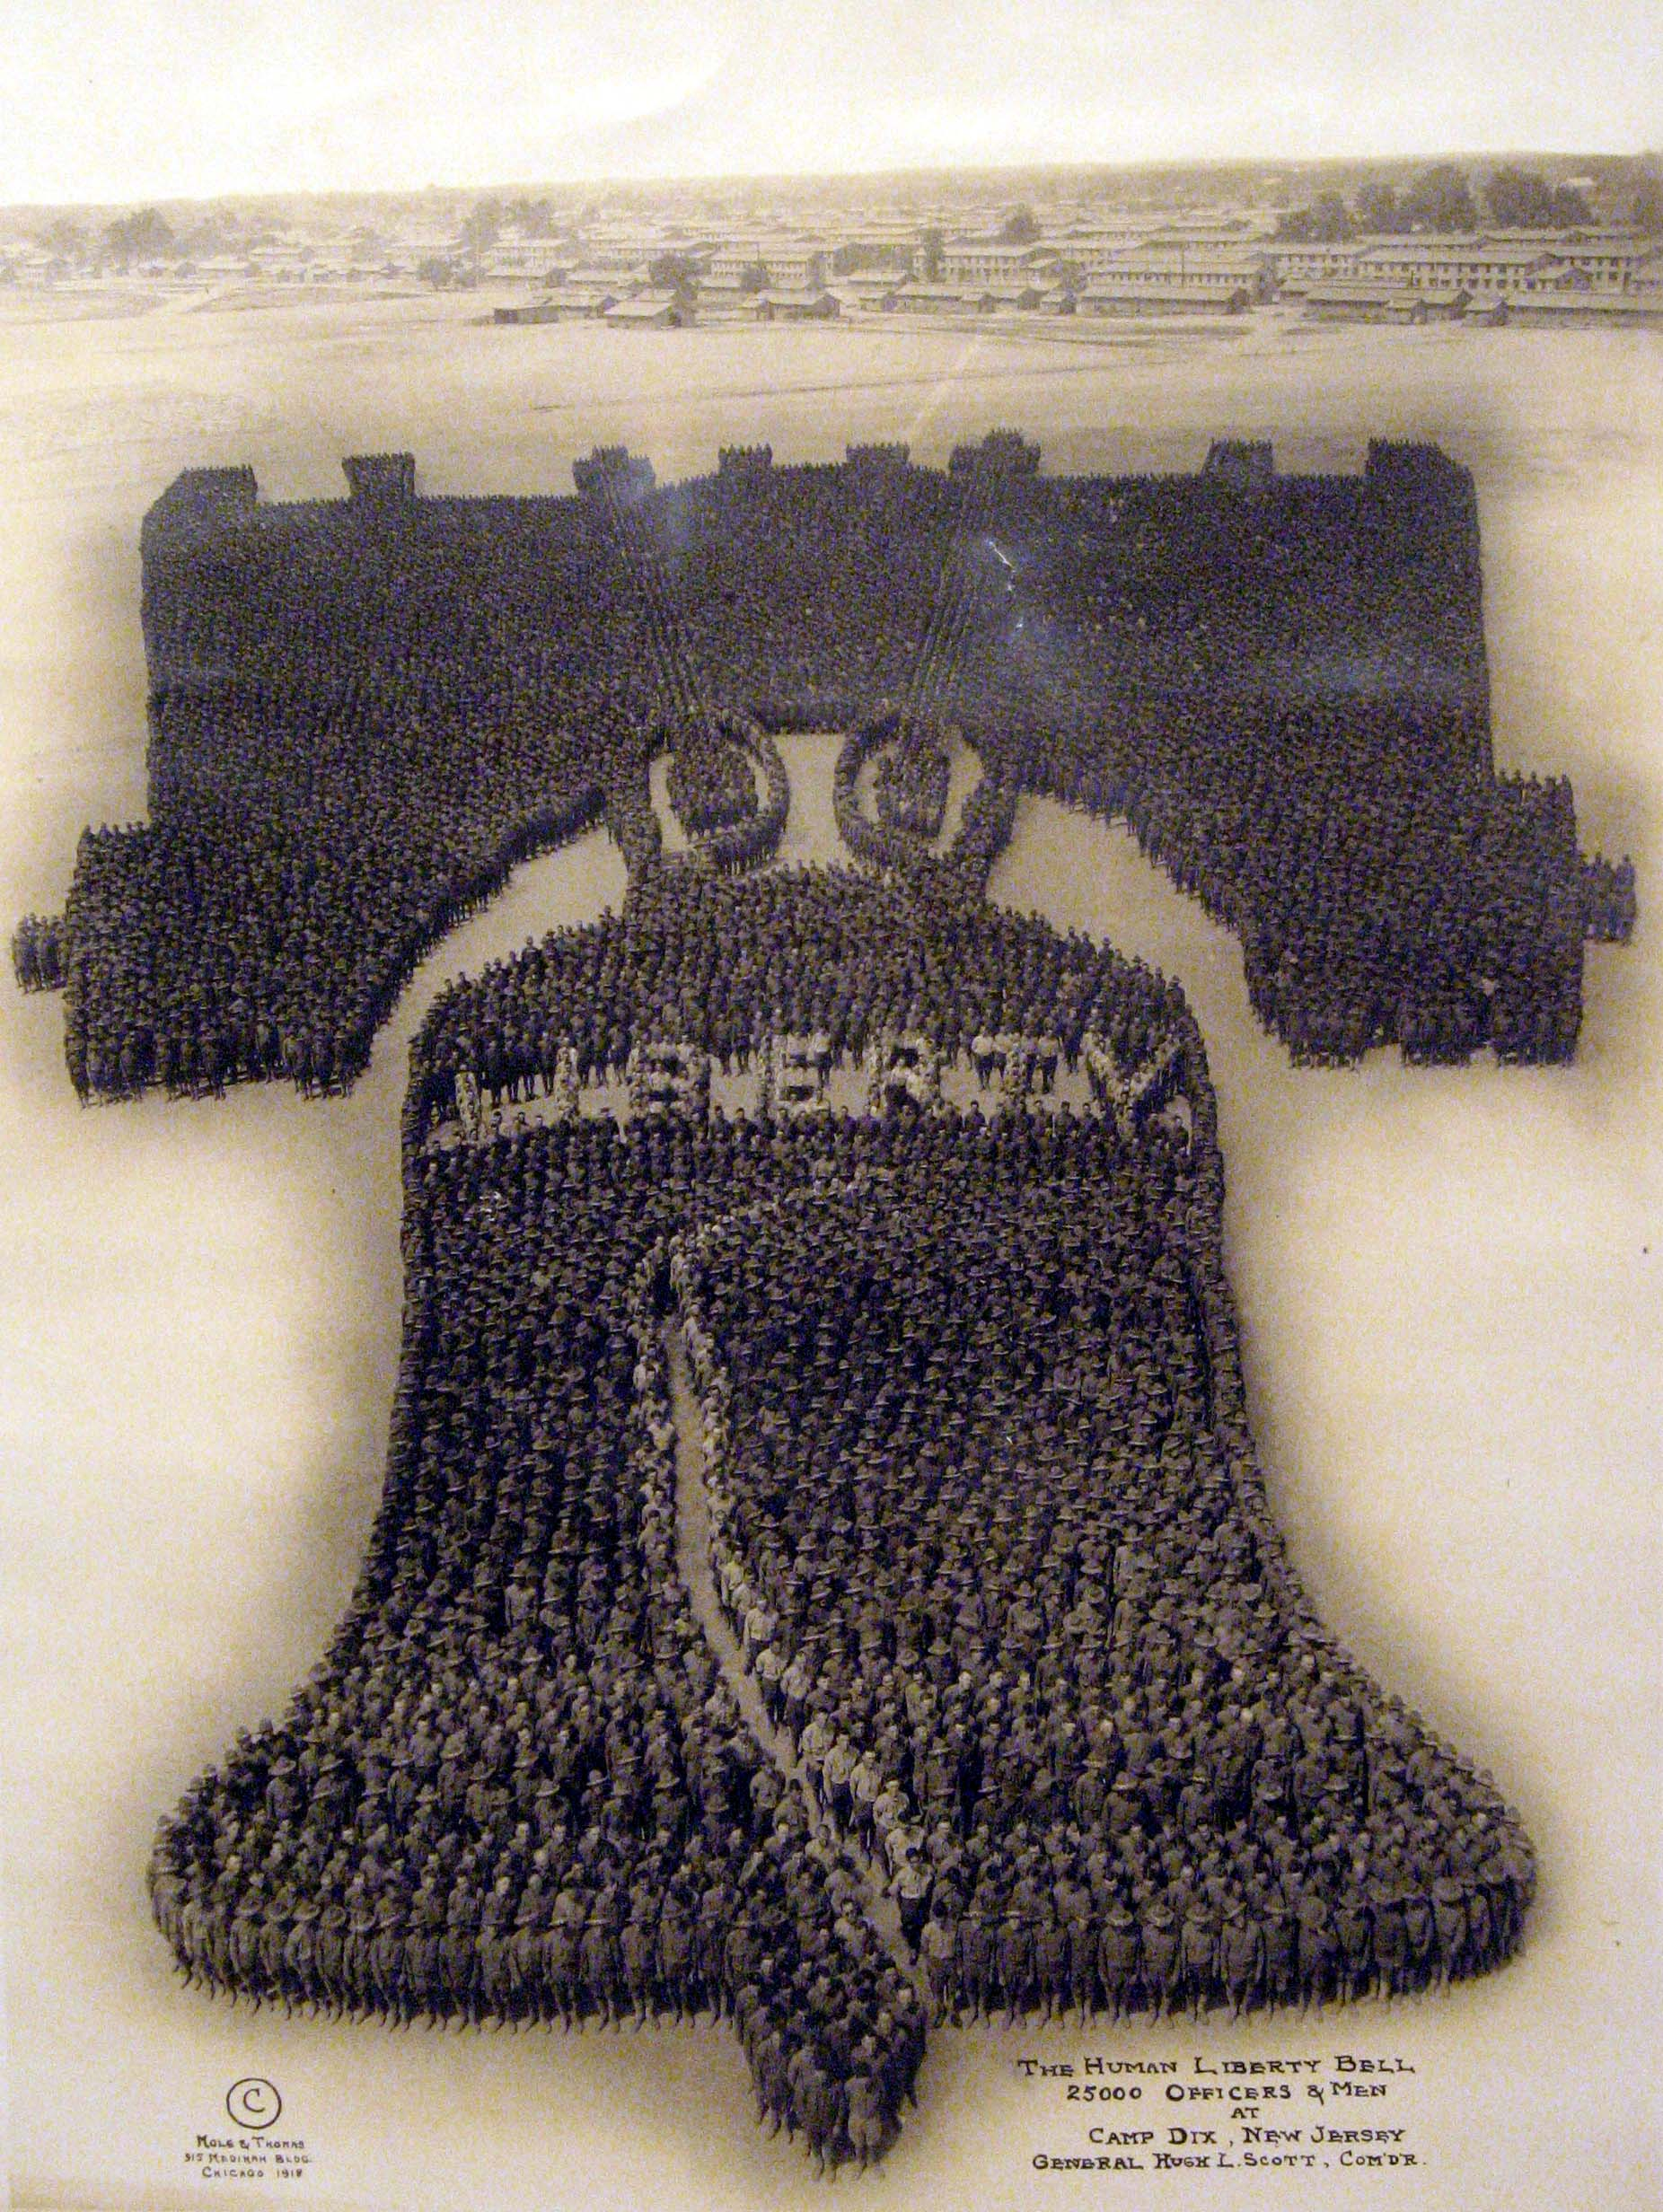 Vintage-Photos-Mole-Thomas-1918-Human-Liberty-Bell-1